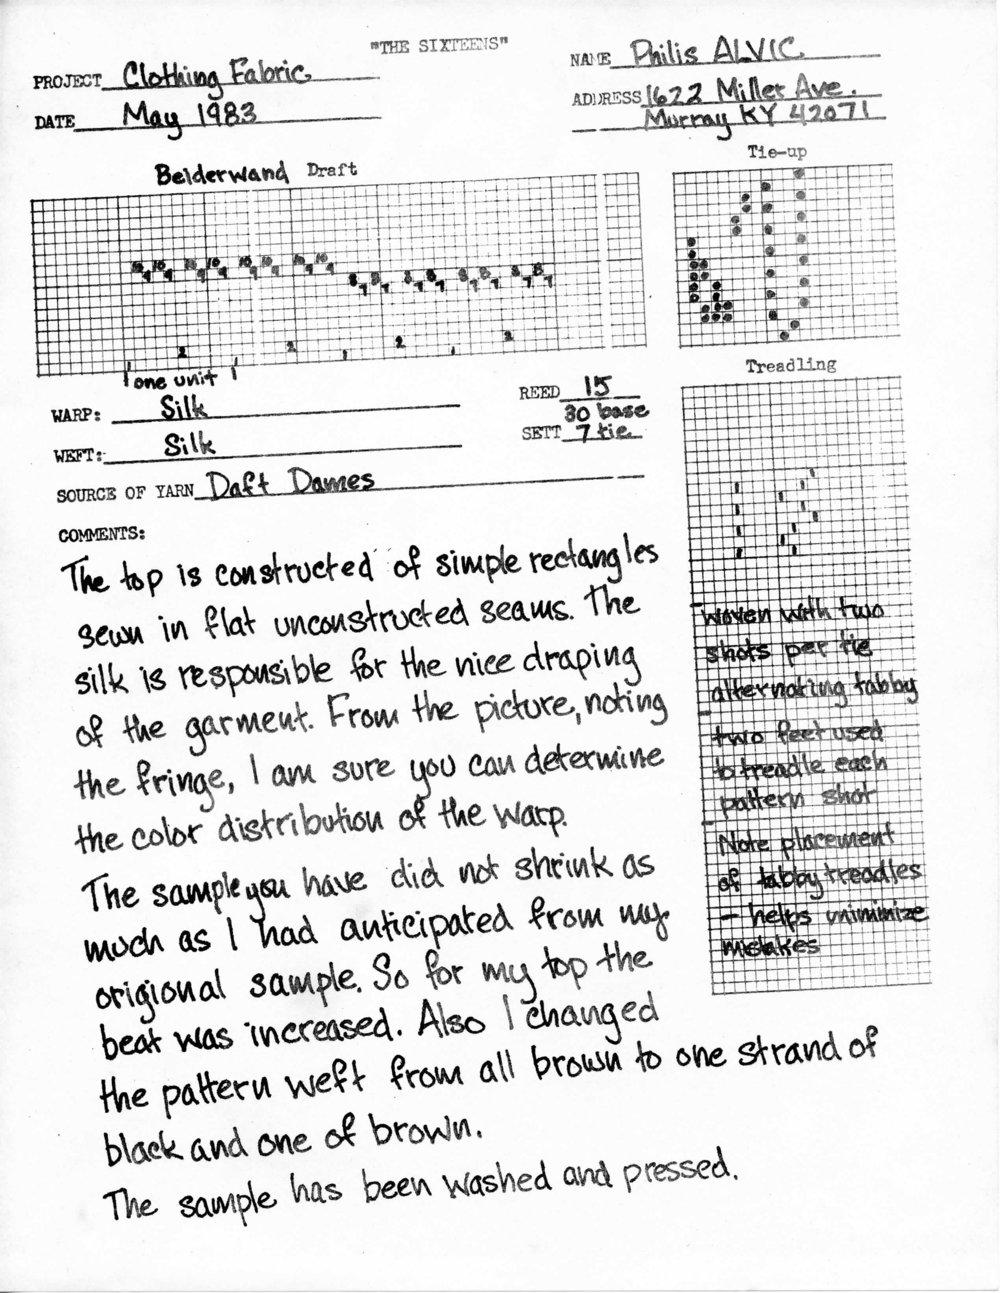 1983_Page_1_Image_0001.jpg